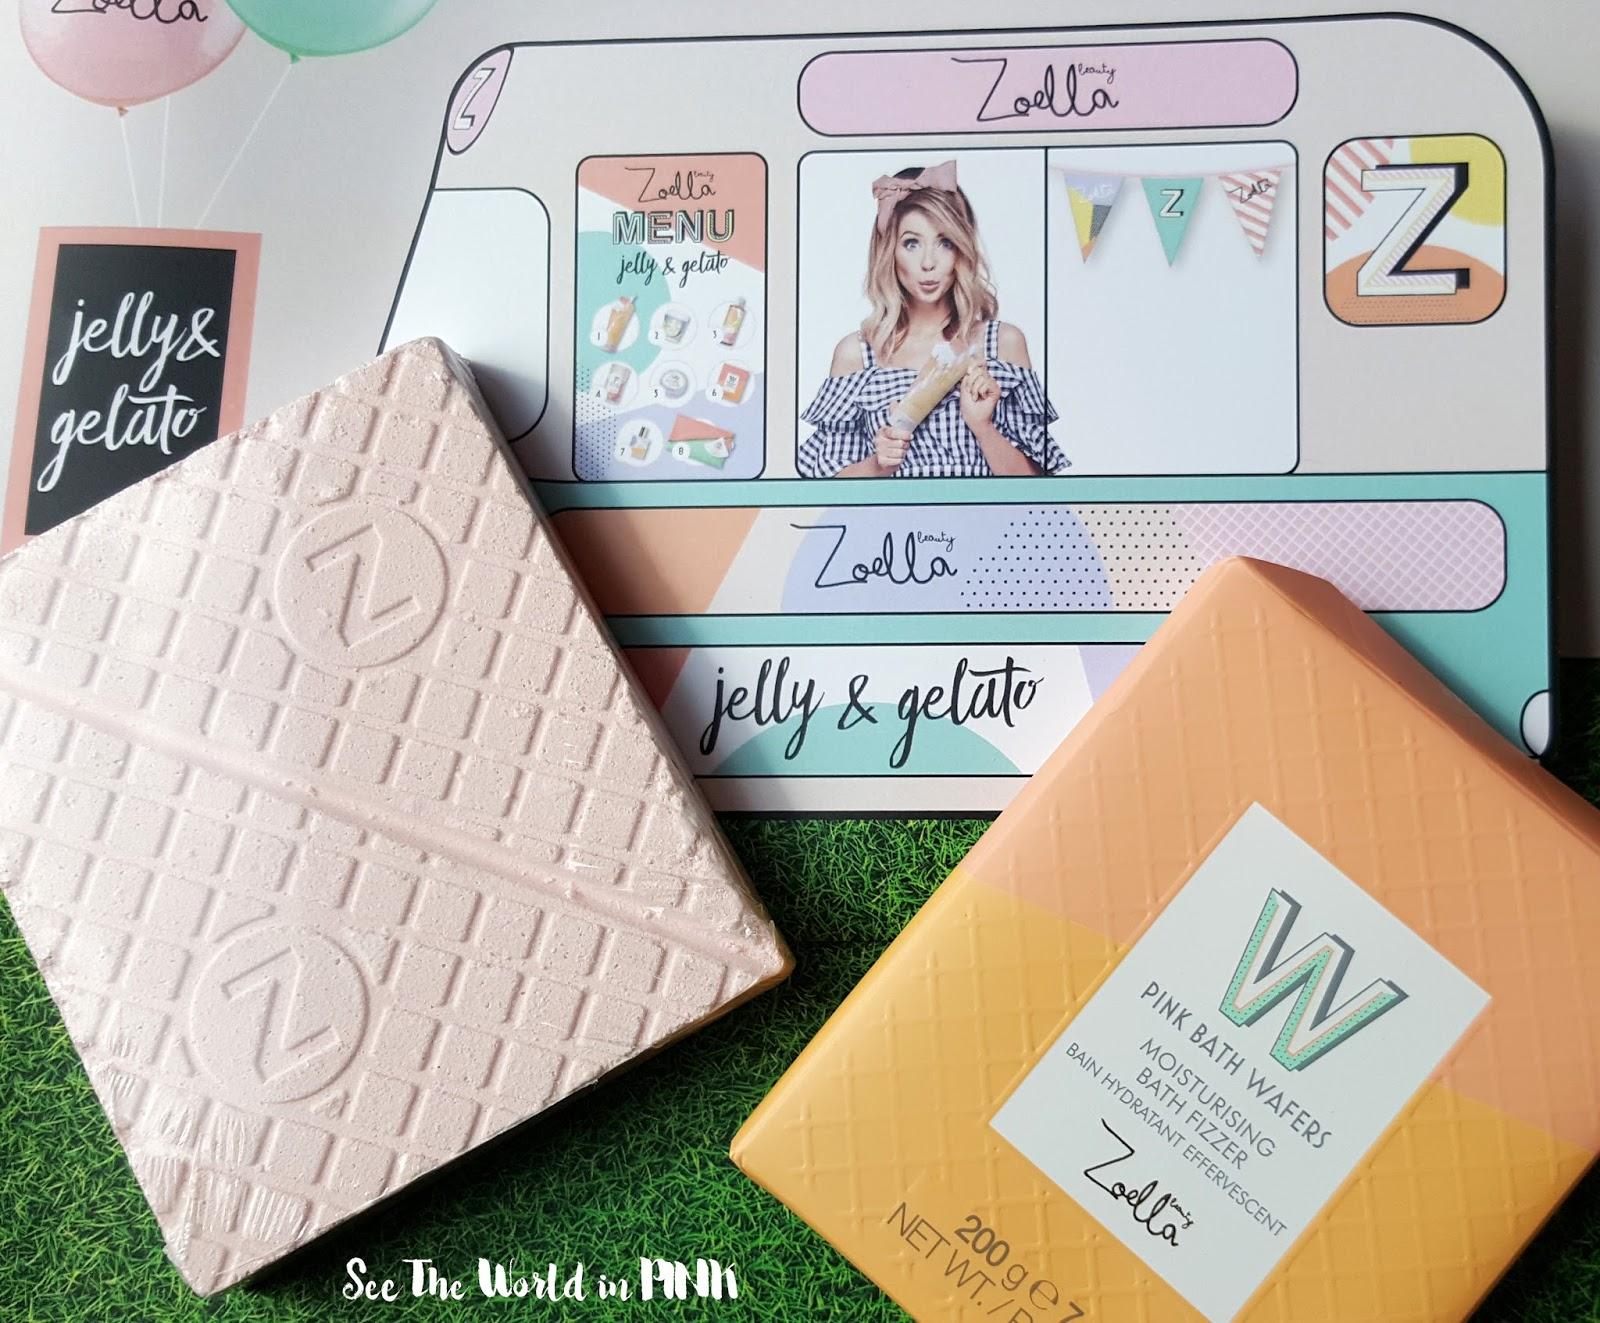 Skincare Sunday - New Zoella Jelly & Gelato Products